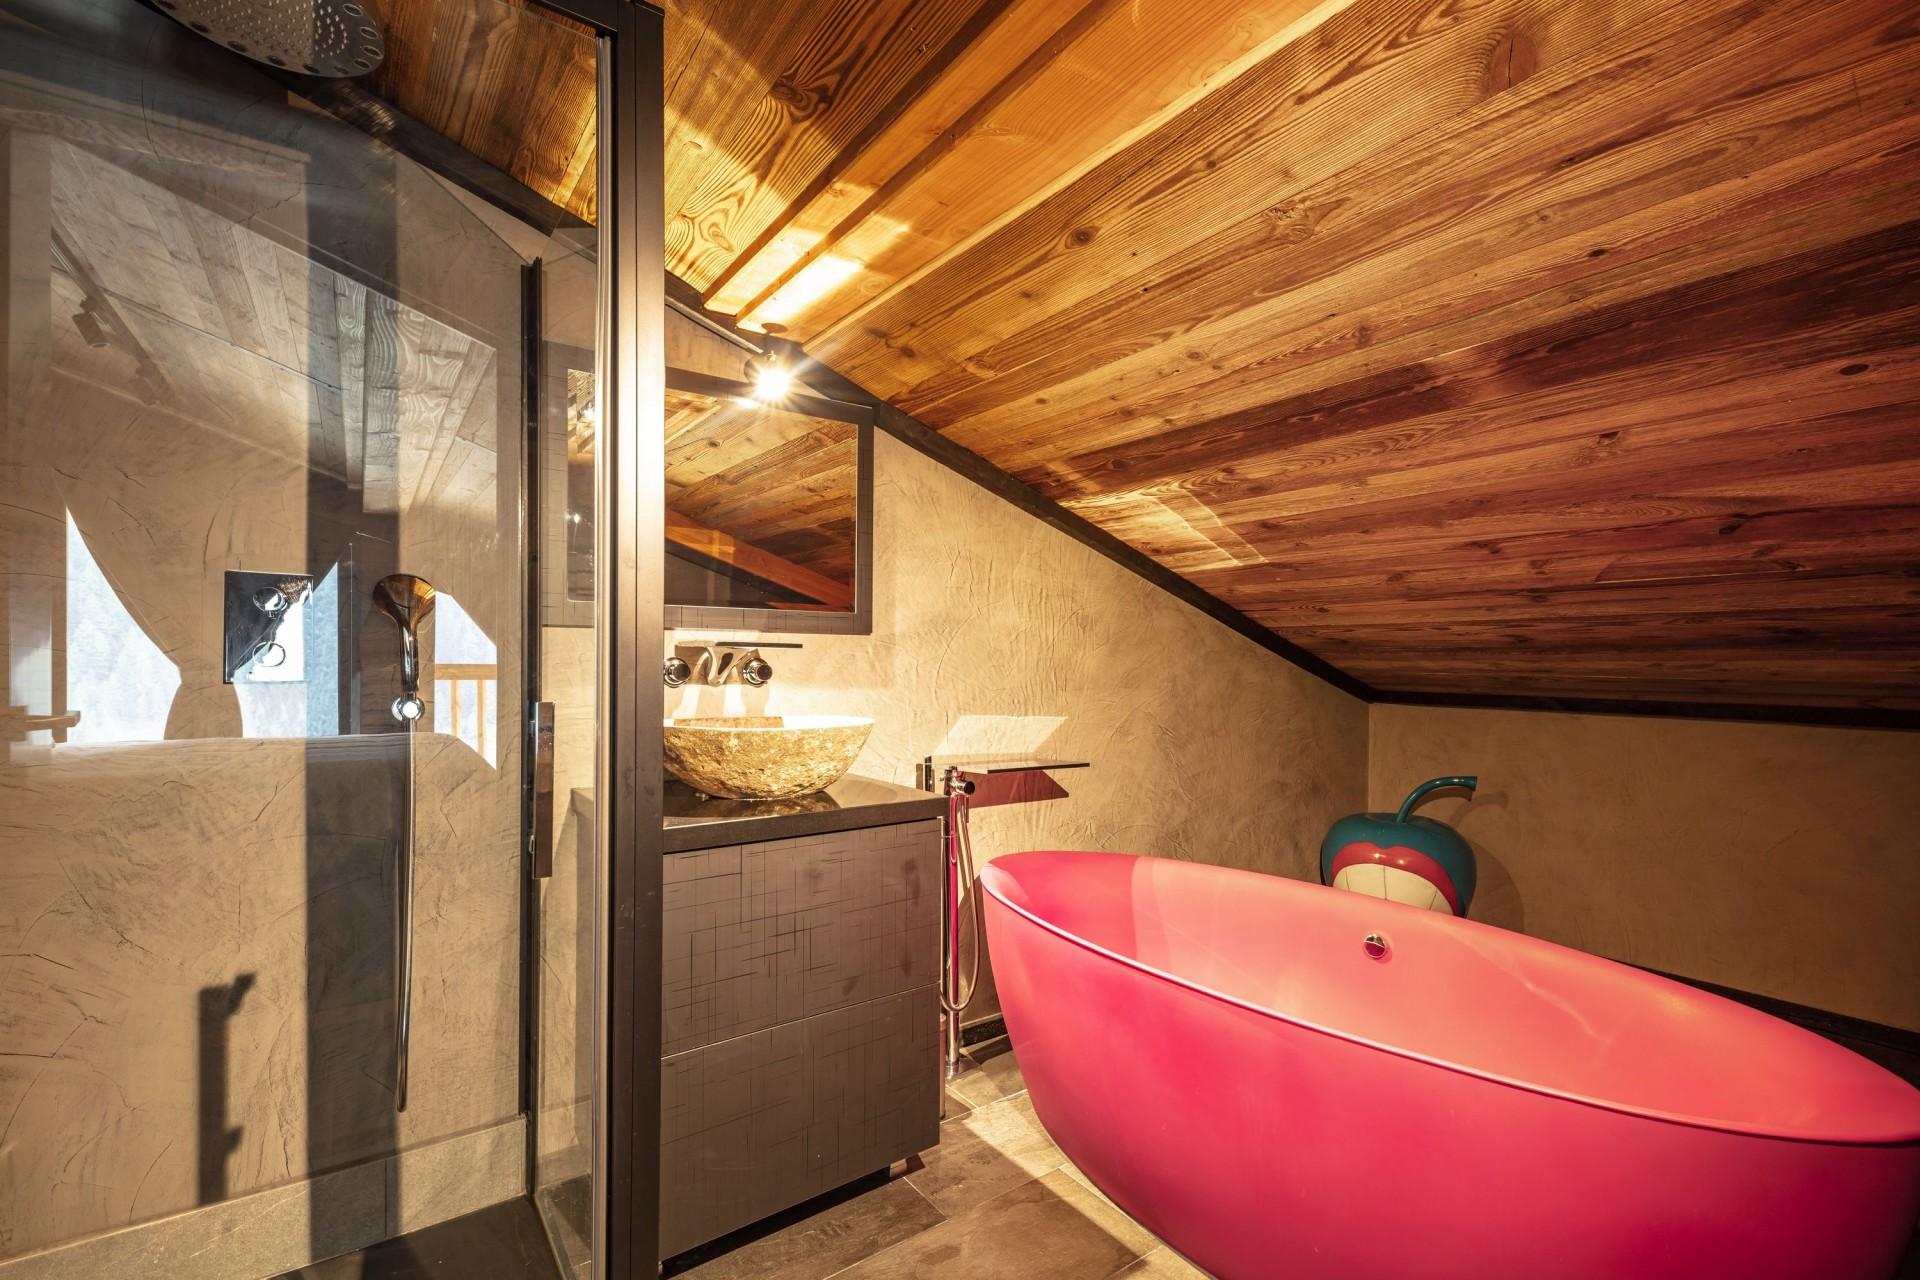 Tignes Location Chalet Luxe Tavanite Salle De Bain5